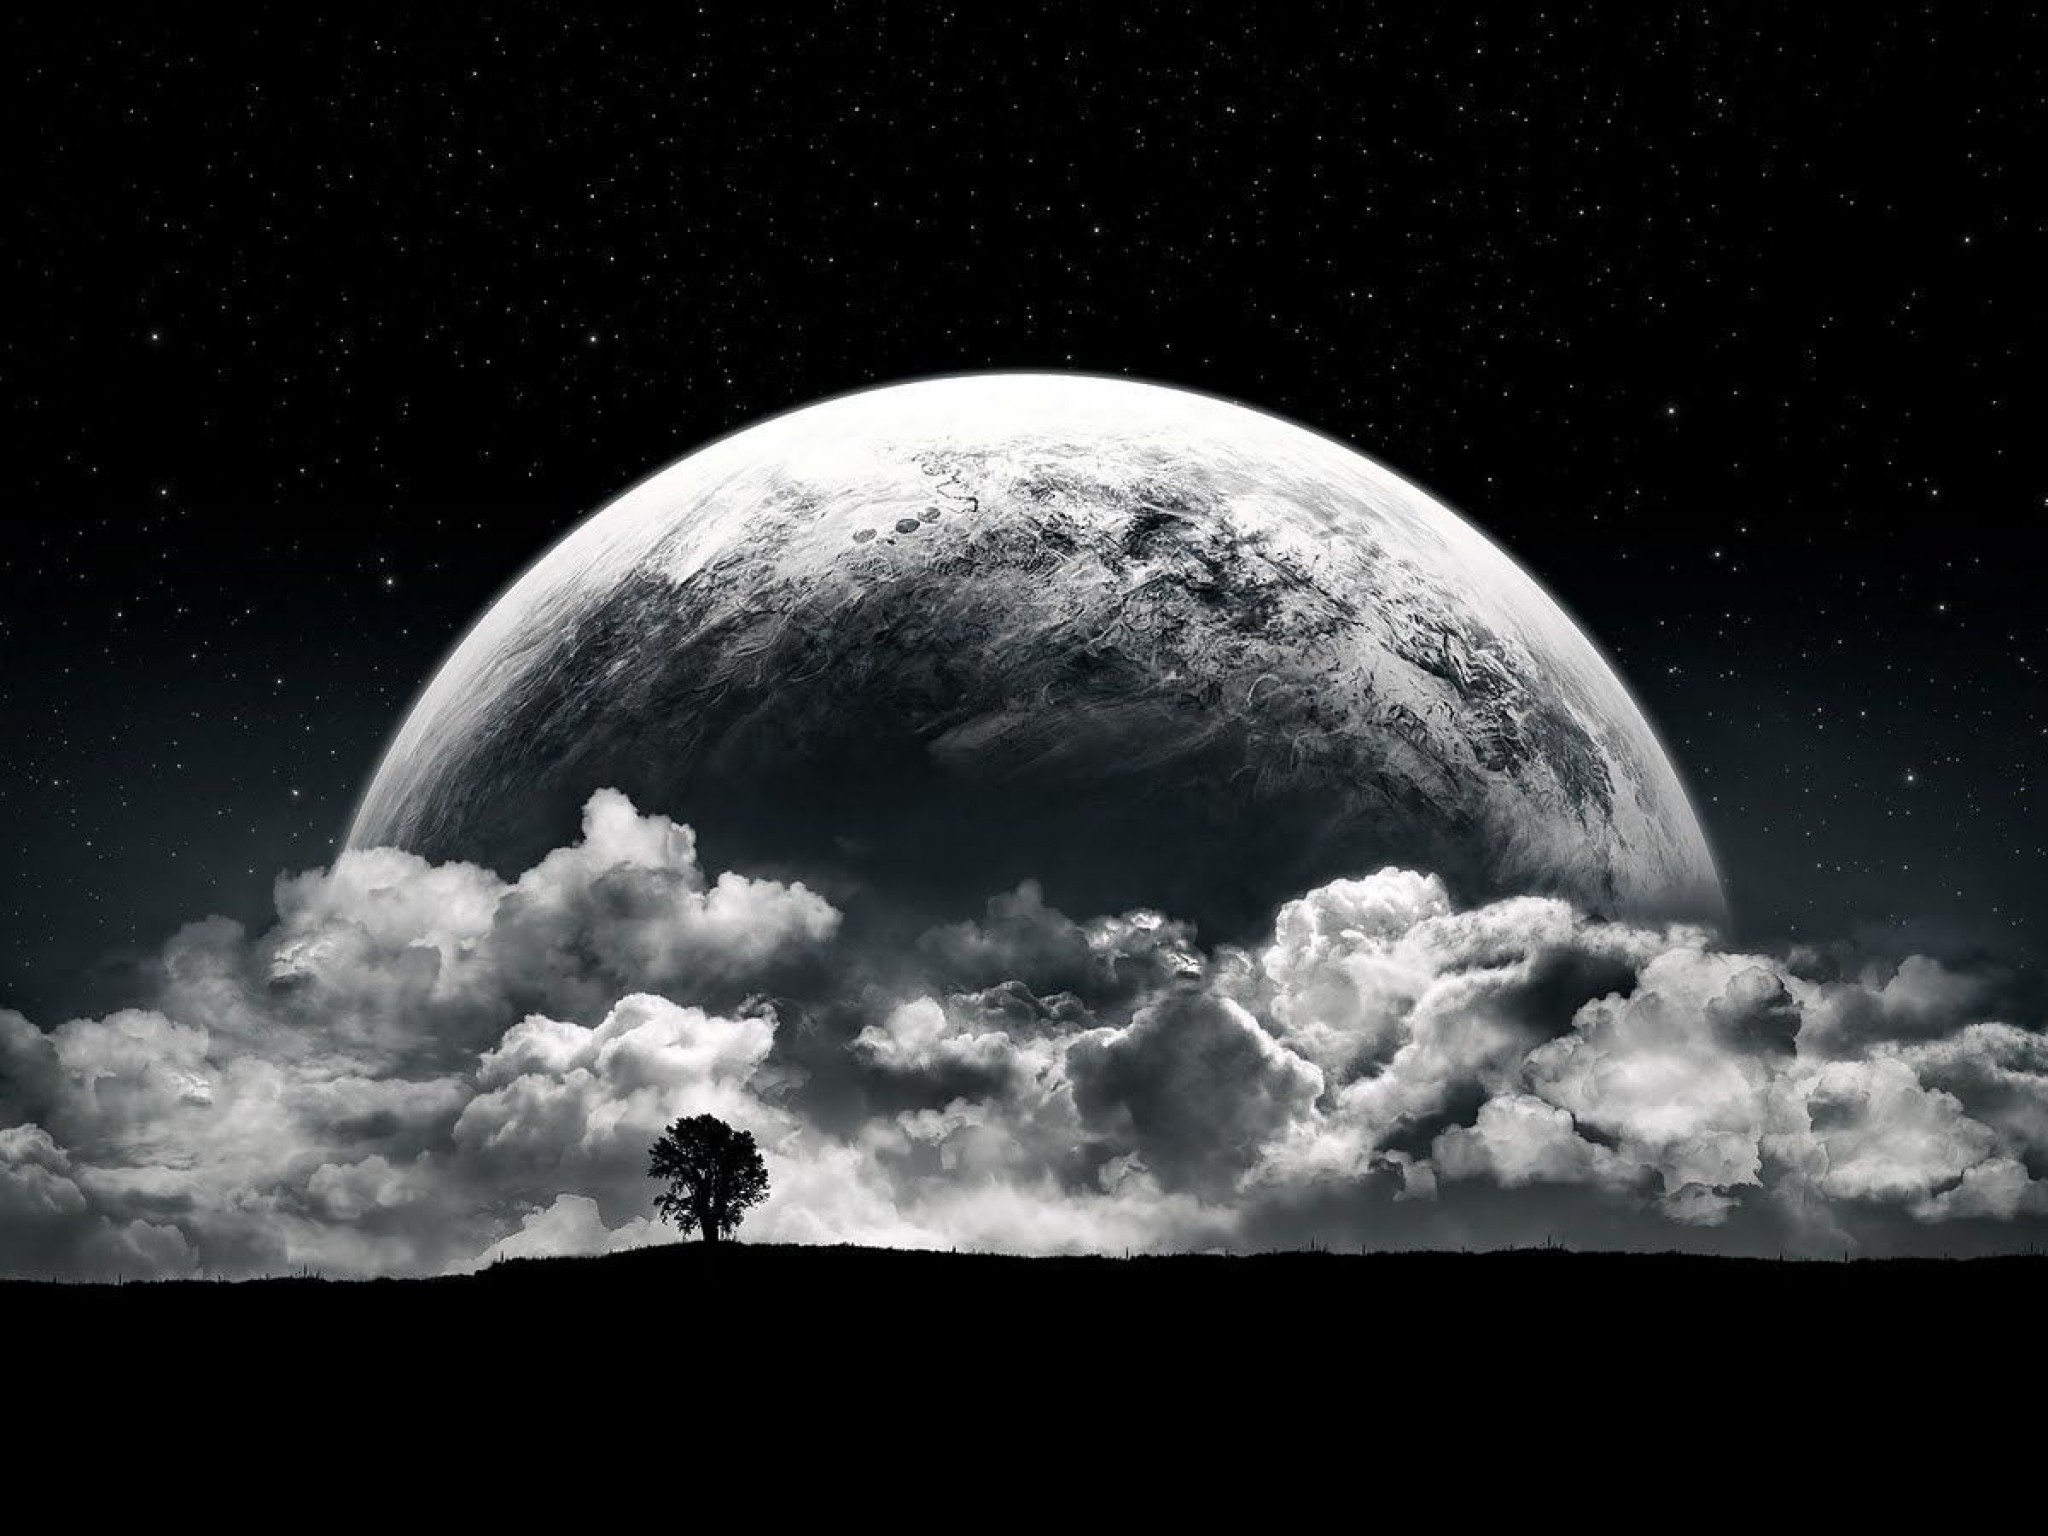 Black Planets Wallpaper 1 Hd Wallpaper